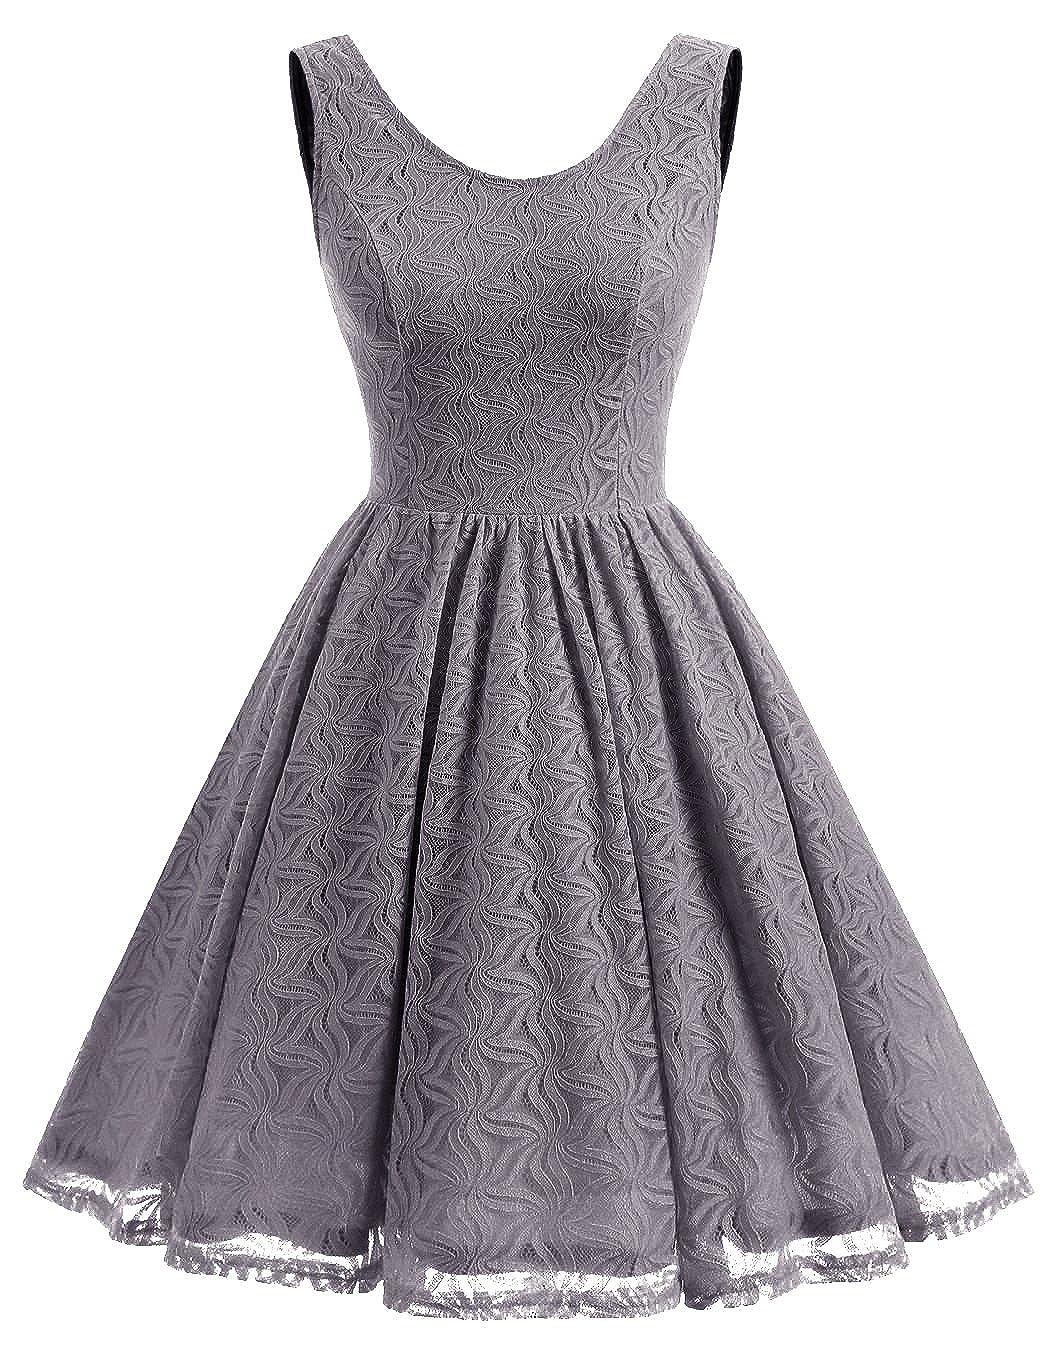 fcd942d52cc26 ALAGIRLS Femme Robe de Vintage sans Manches Col Rond et V en Dos ...